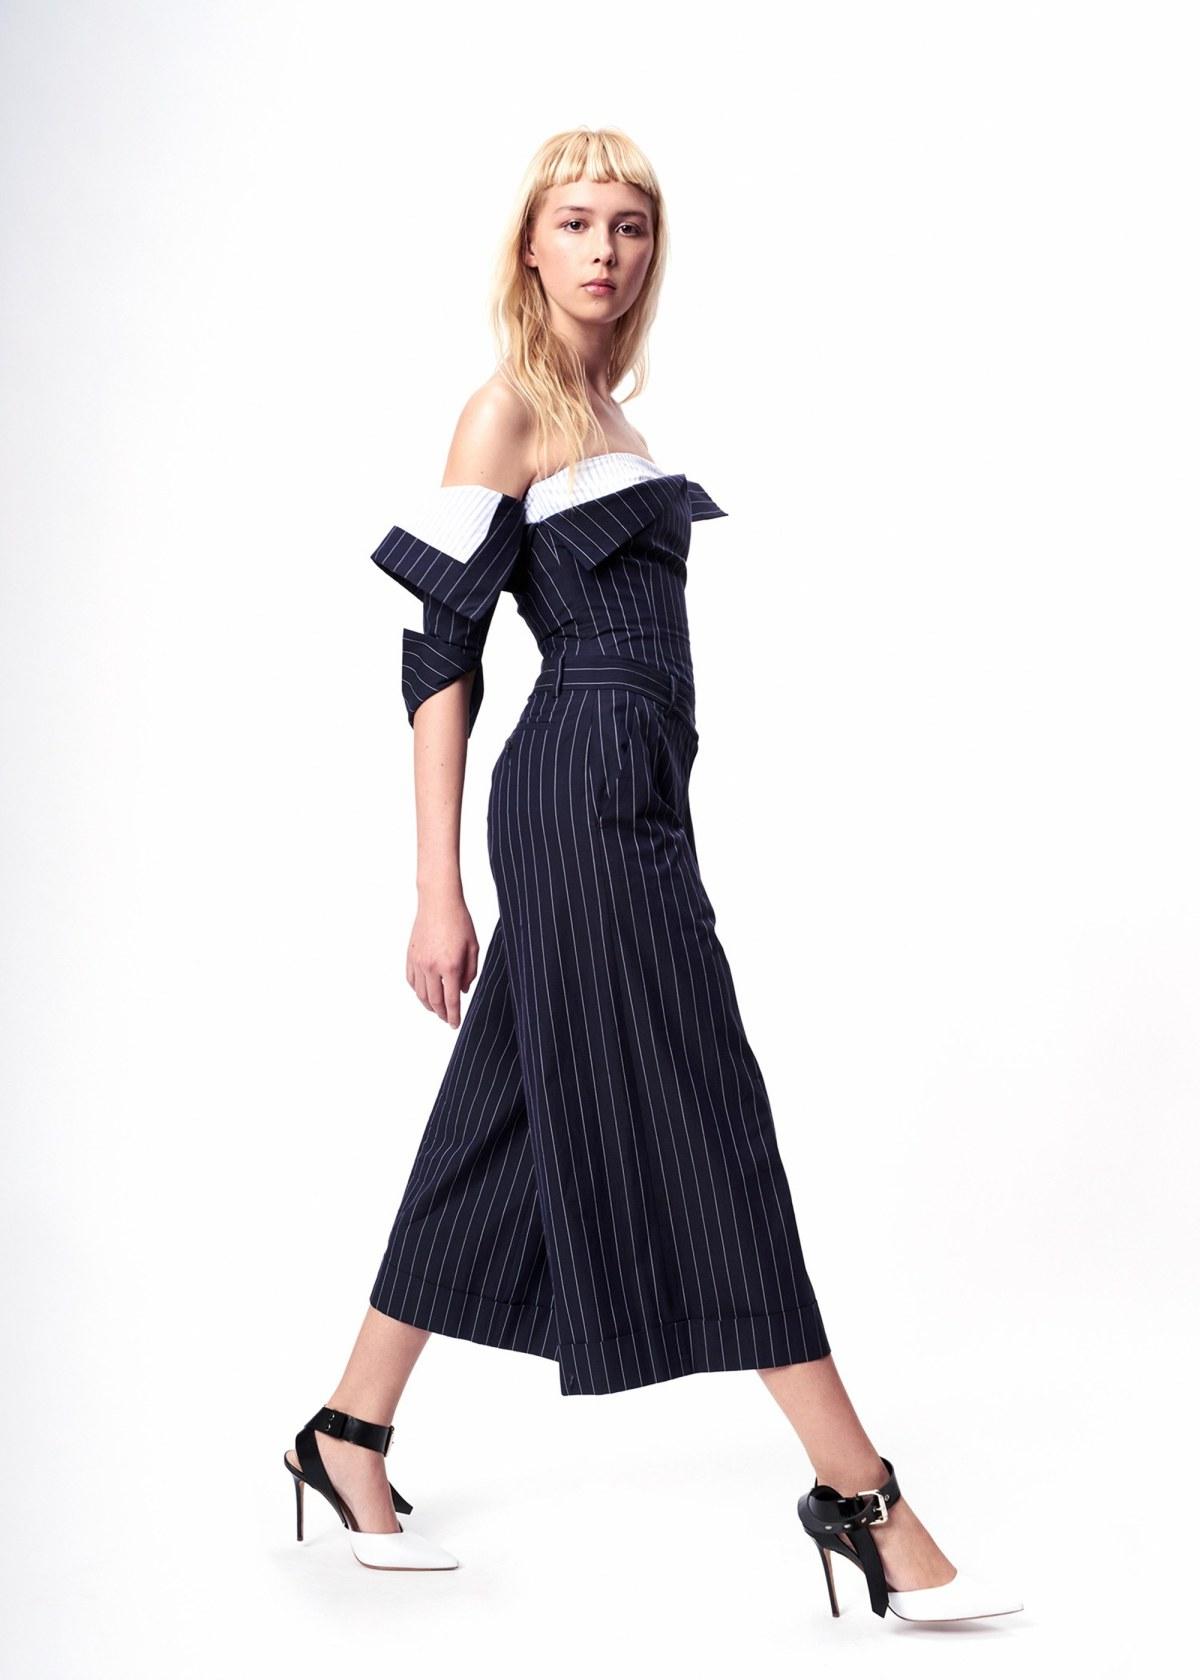 monse-pre-fall-2017-fashion-show-the-impression-08